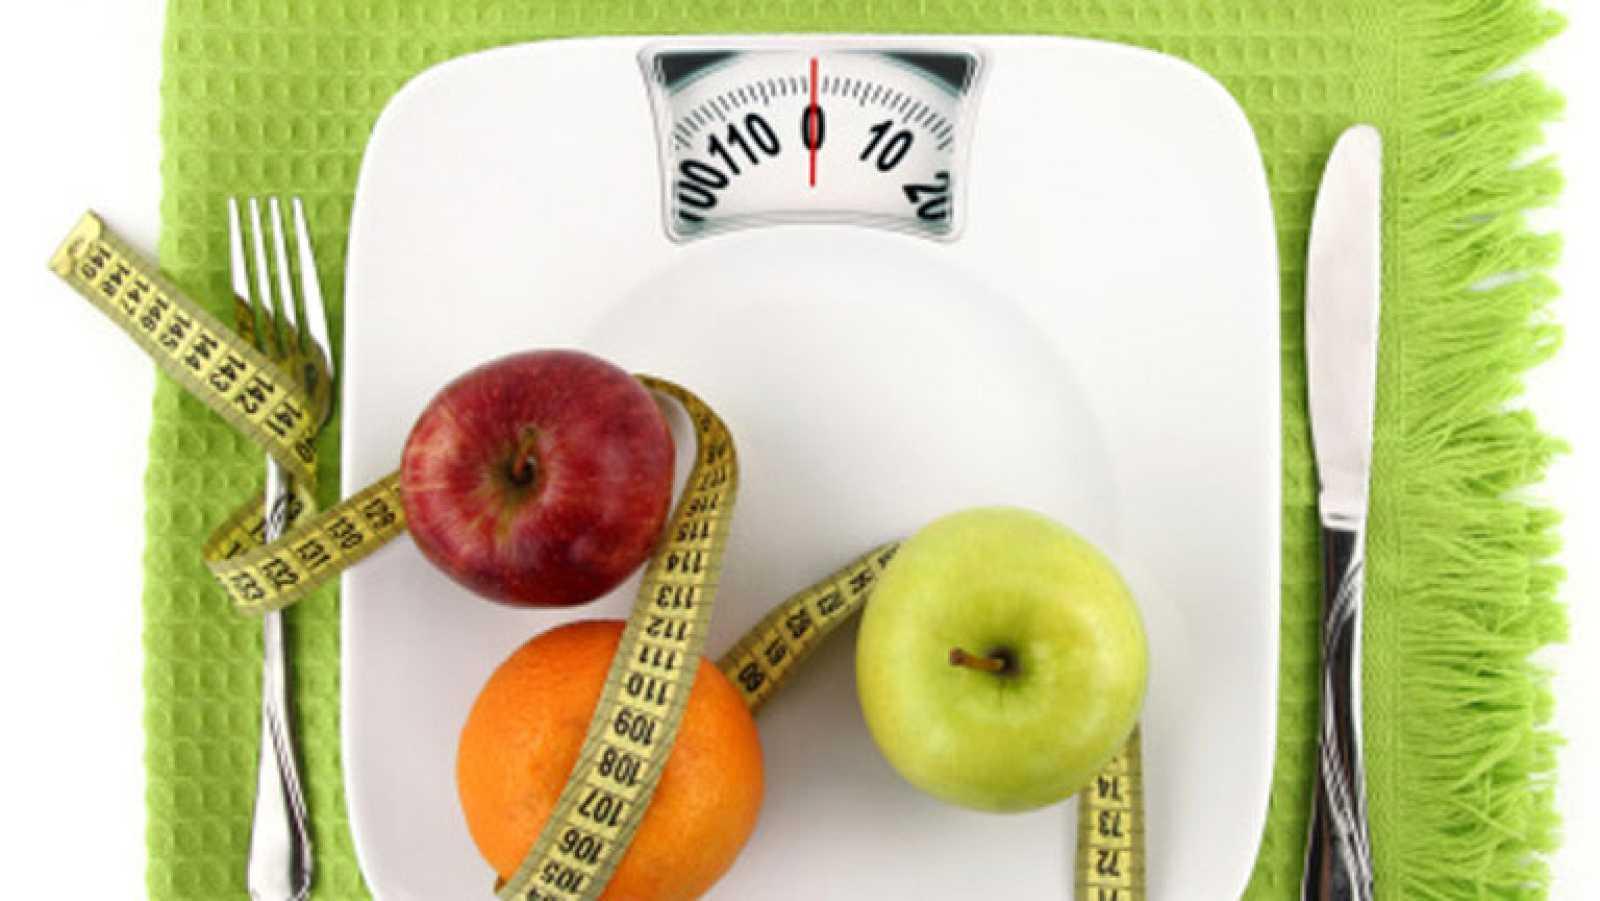 Saber Vivir Dietas Para Adelgazar Rtve Es ~ Dieta Adelgazamiento Saber Vivir